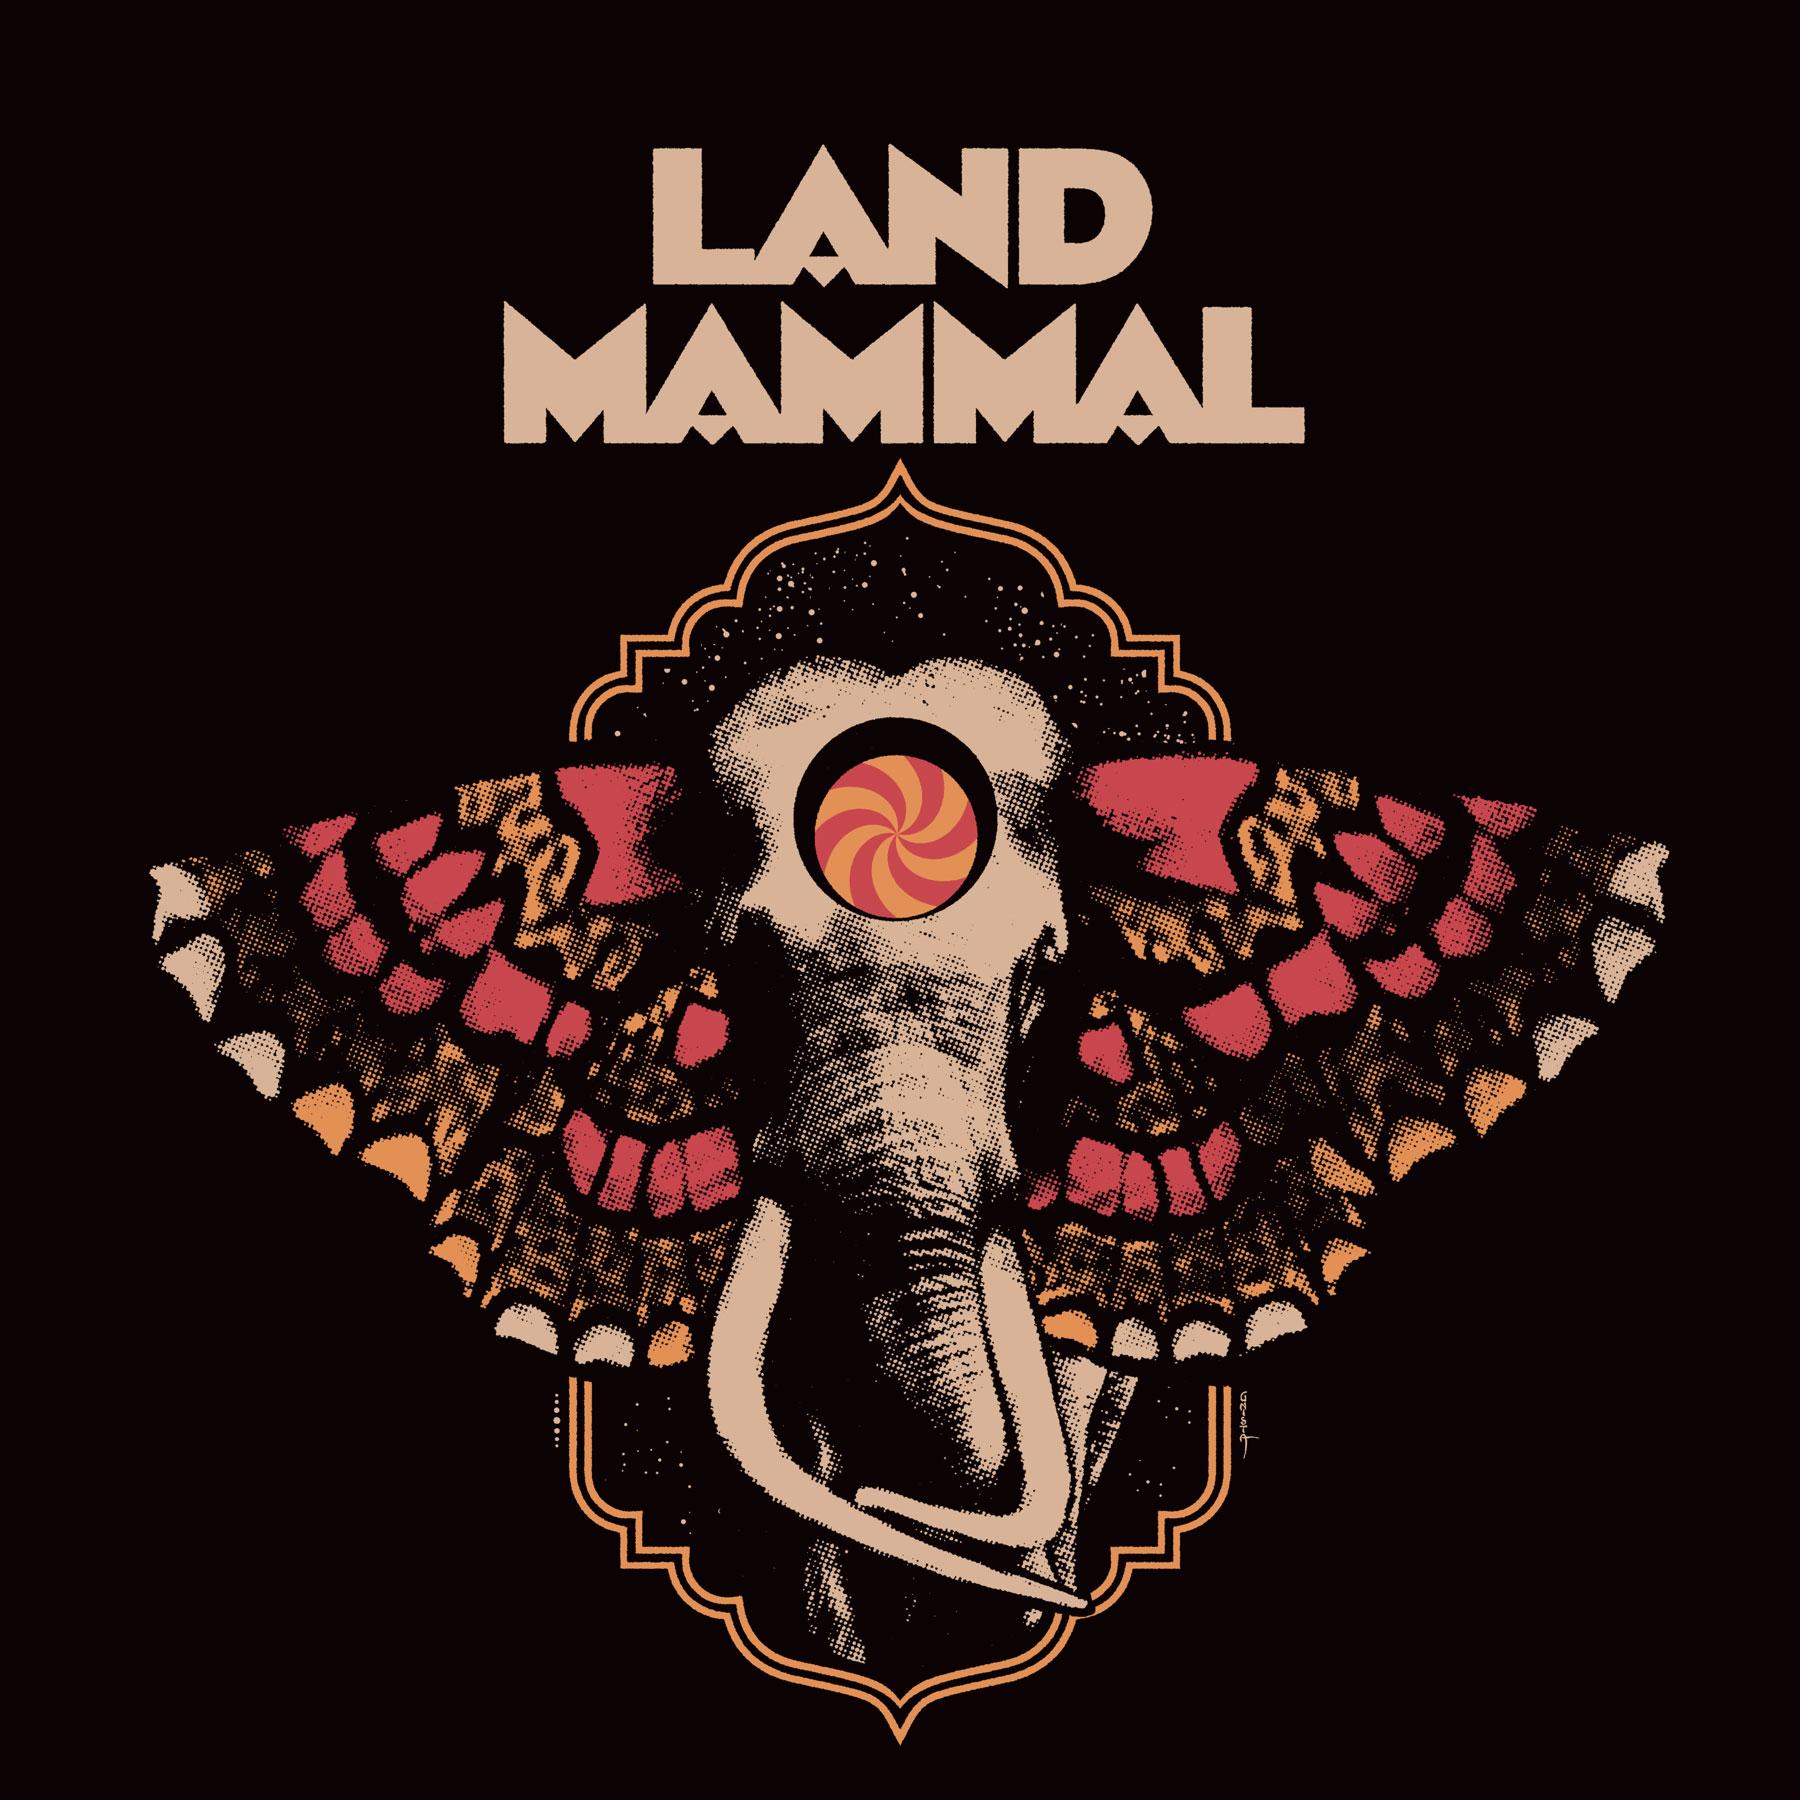 land mammal land mammal